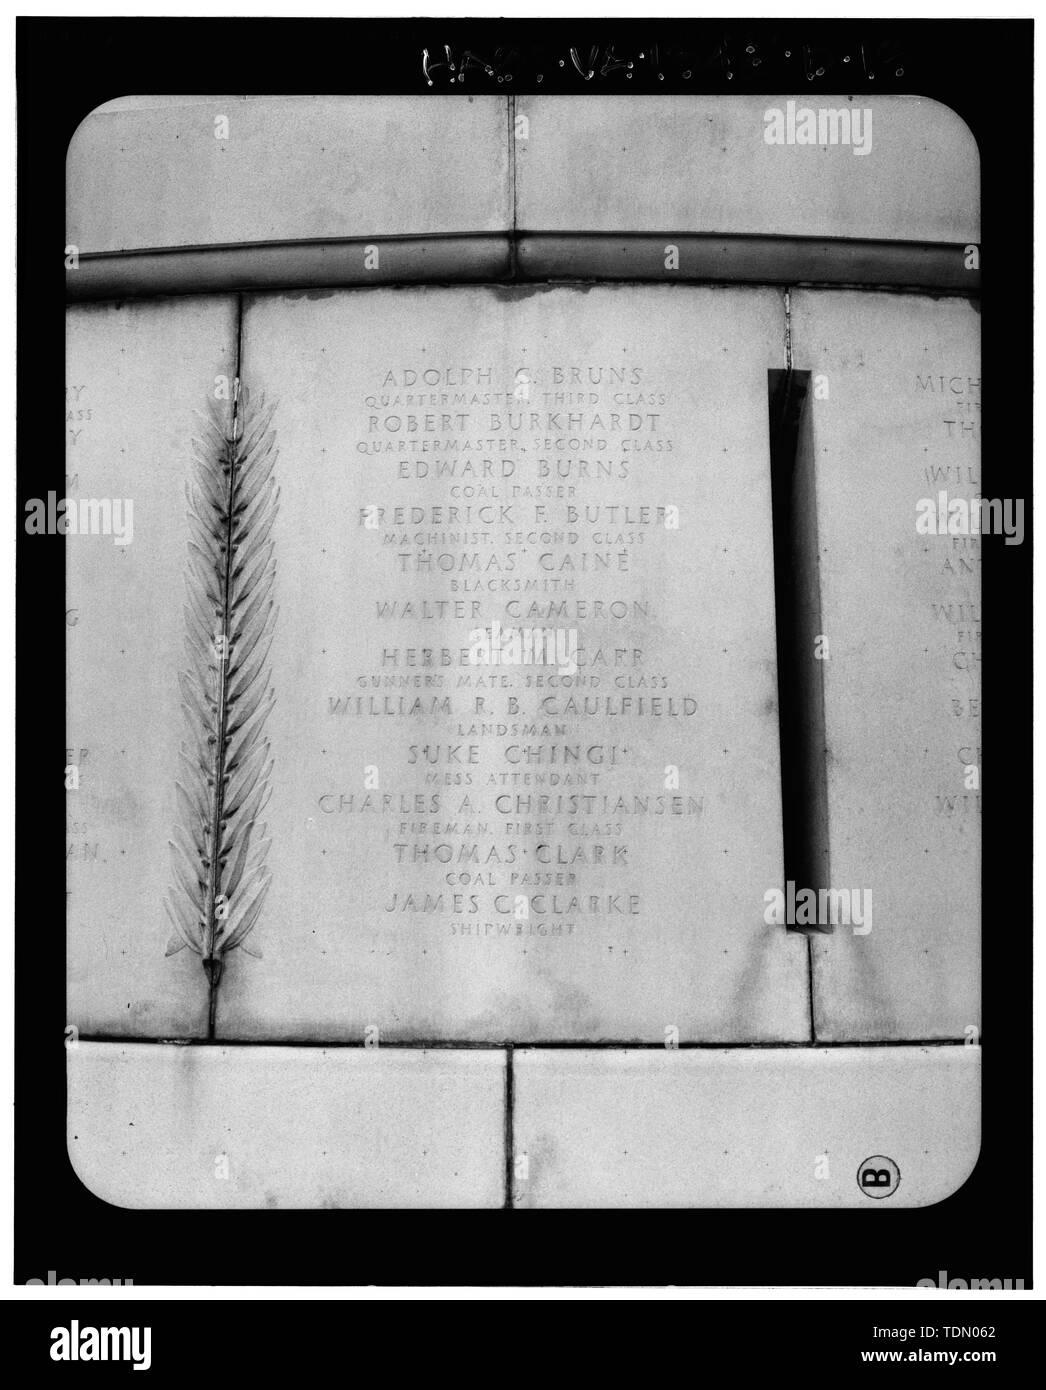 Panel 3 - Arlington National Cemetery, USS Maine Memorial, Arlington, Arlington County, VA; U.S. Army Corps of Engineers; Wyeth, Nathan C; Black, William M; Patrick, Mason M; Ferguson, H B; Bixby, W H; Goodson, W F; Lackawanna Steel Company; T.L. Huston Construction Company; Harris Brothers; Clark, D Lombillo; Primelles, Arturo; Rhodes, D H; Jenkins, Oliver B; Tilford, James D; Aleshire, J B; Stimson, H E; Scofield, John J; Hugh, R P; Houston, J B; Sharpe, Henry G; Downey, G F; Clem, L; Cosby, Spencer; Taft, William Howard; Commission of Fine Arts; Olmsted, Fredrick Law; French, Daniel Chester - Stock Image